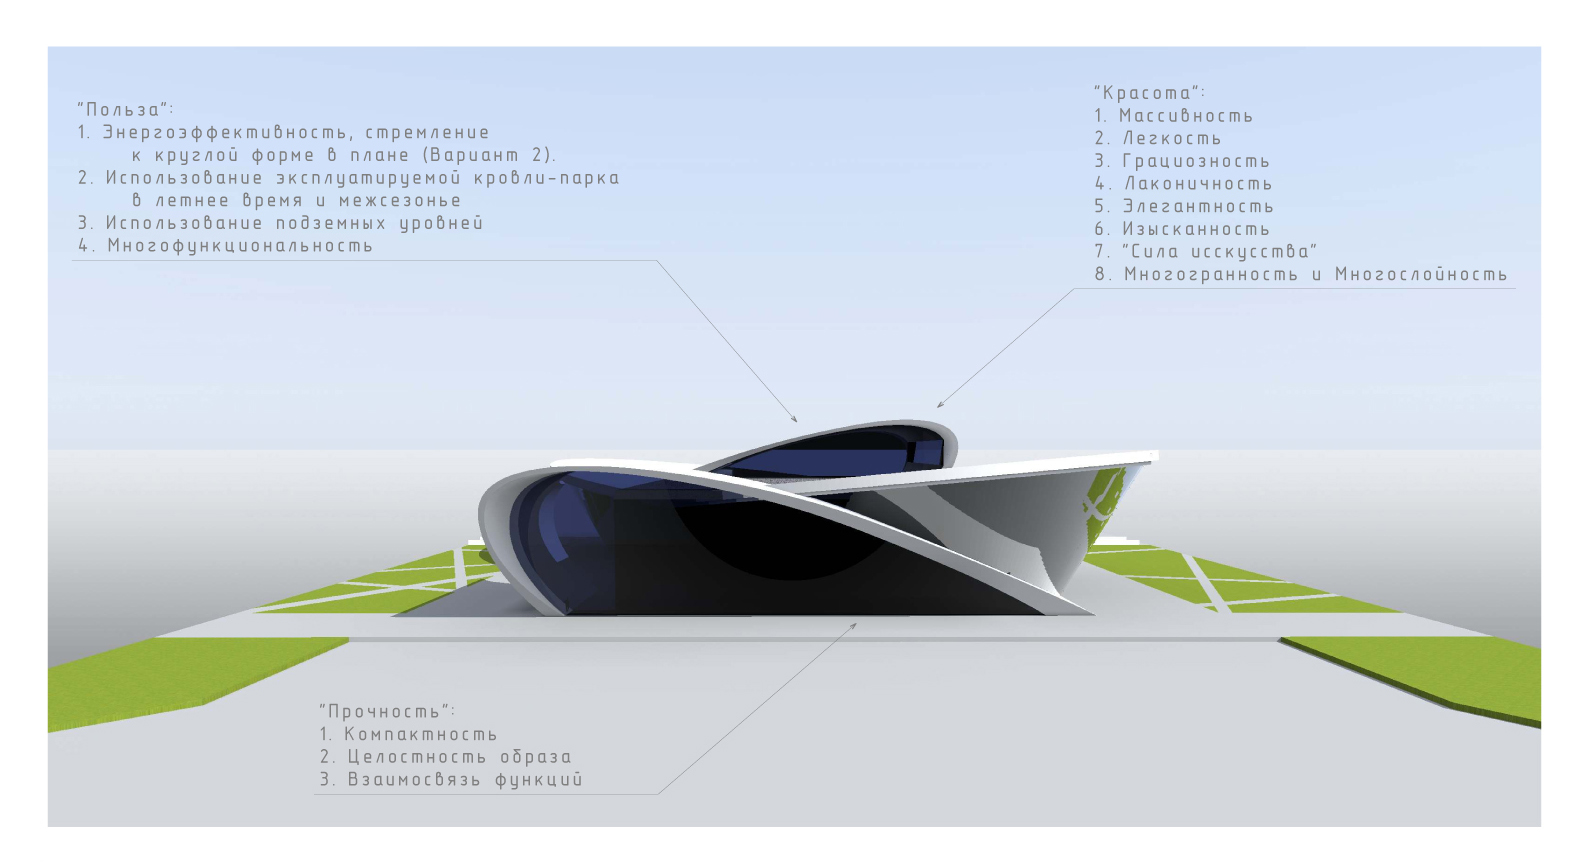 Разработка архитектурной концепции театра оперы и балета фото f_88952ede6cc85ca4.jpg